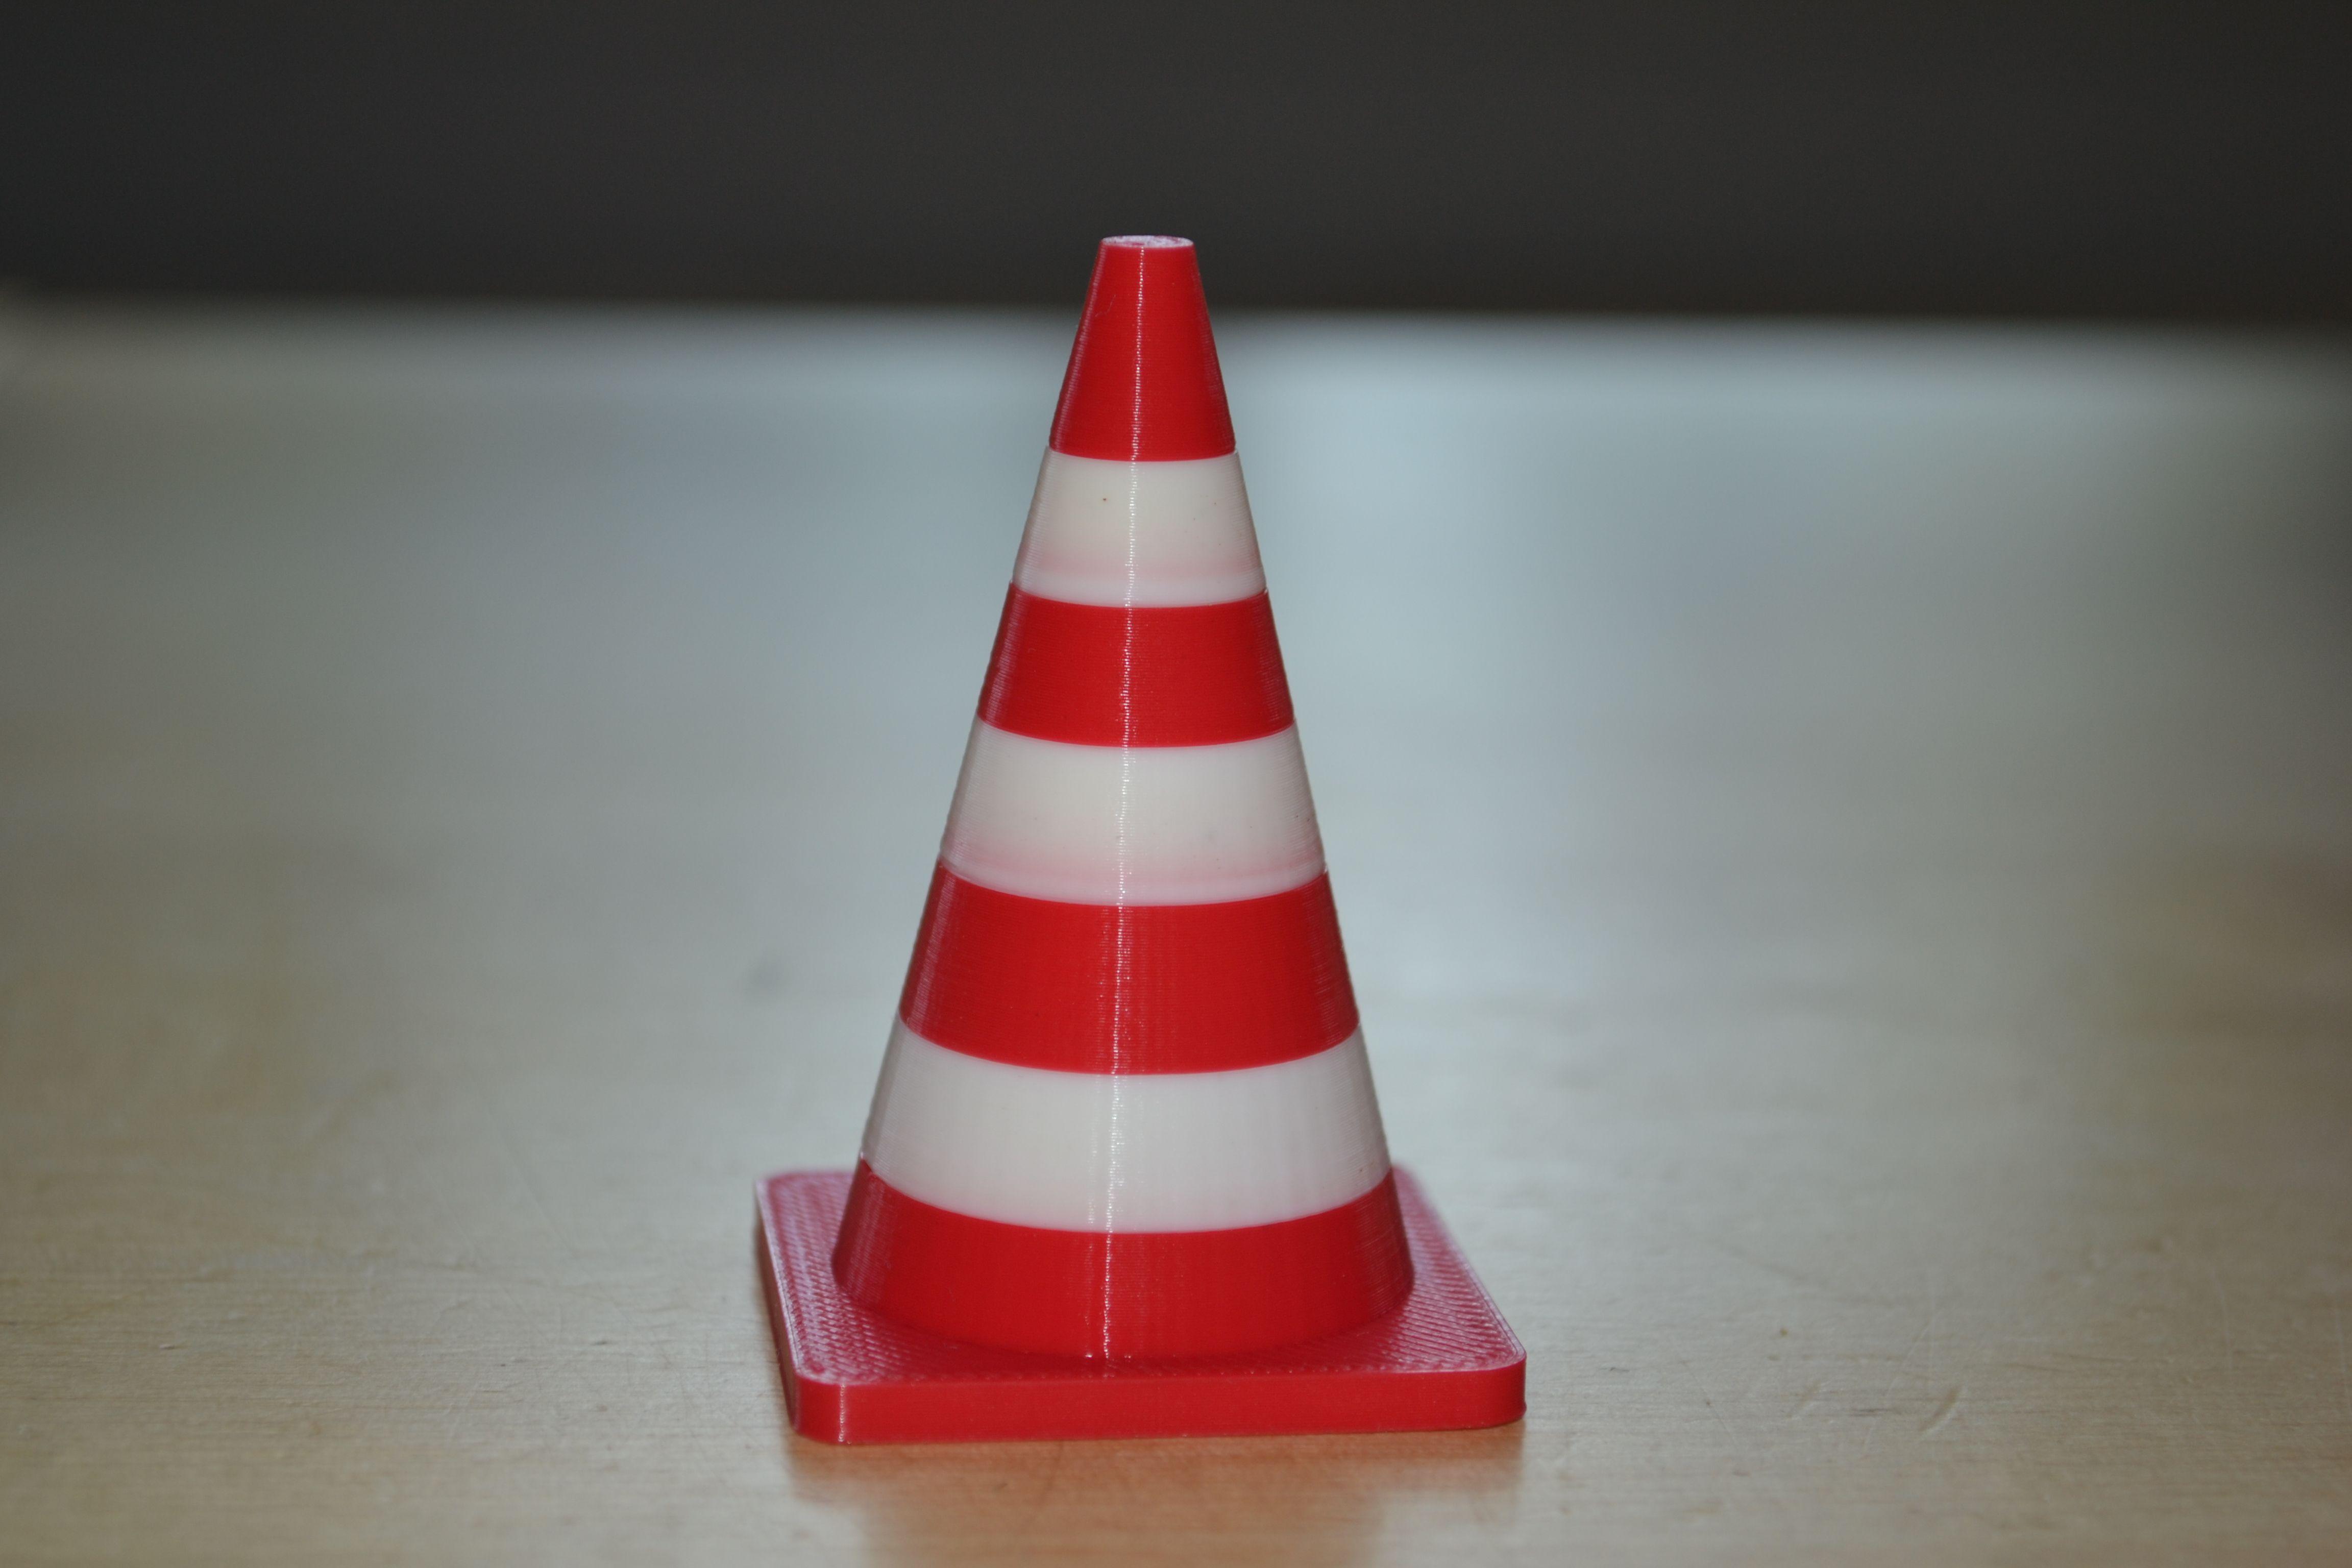 3d printed traffic cone 3d printing cool stuff pinterest